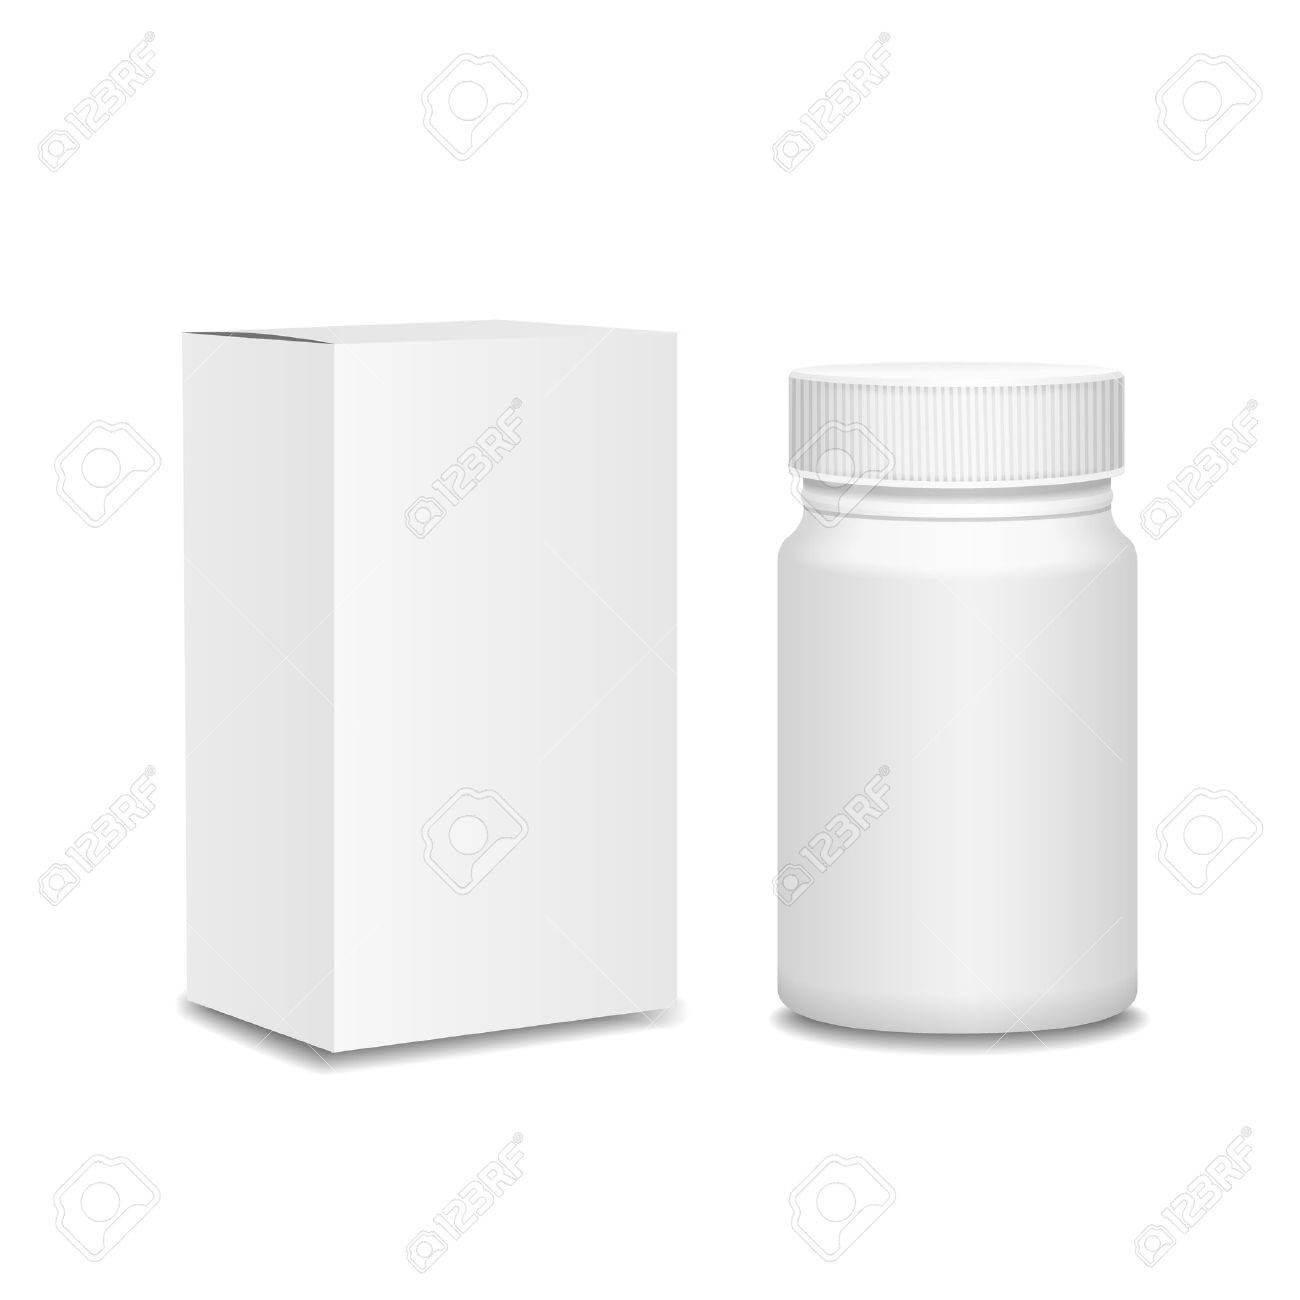 Blank Medicine Bottle And Cardboard Packaging, Vitamins, Examples.. inside Blank Packaging Templates